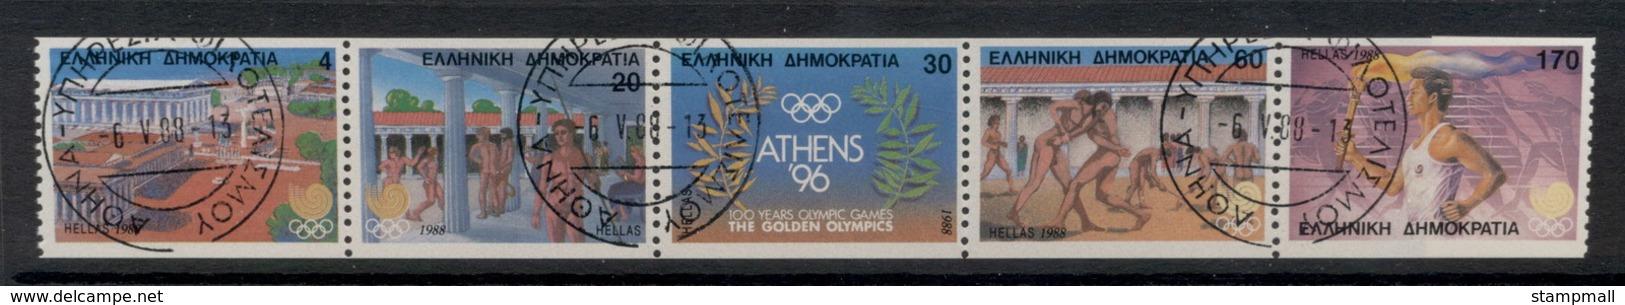 Greece 1988 Olympics Booklet Pane CTO - Greece